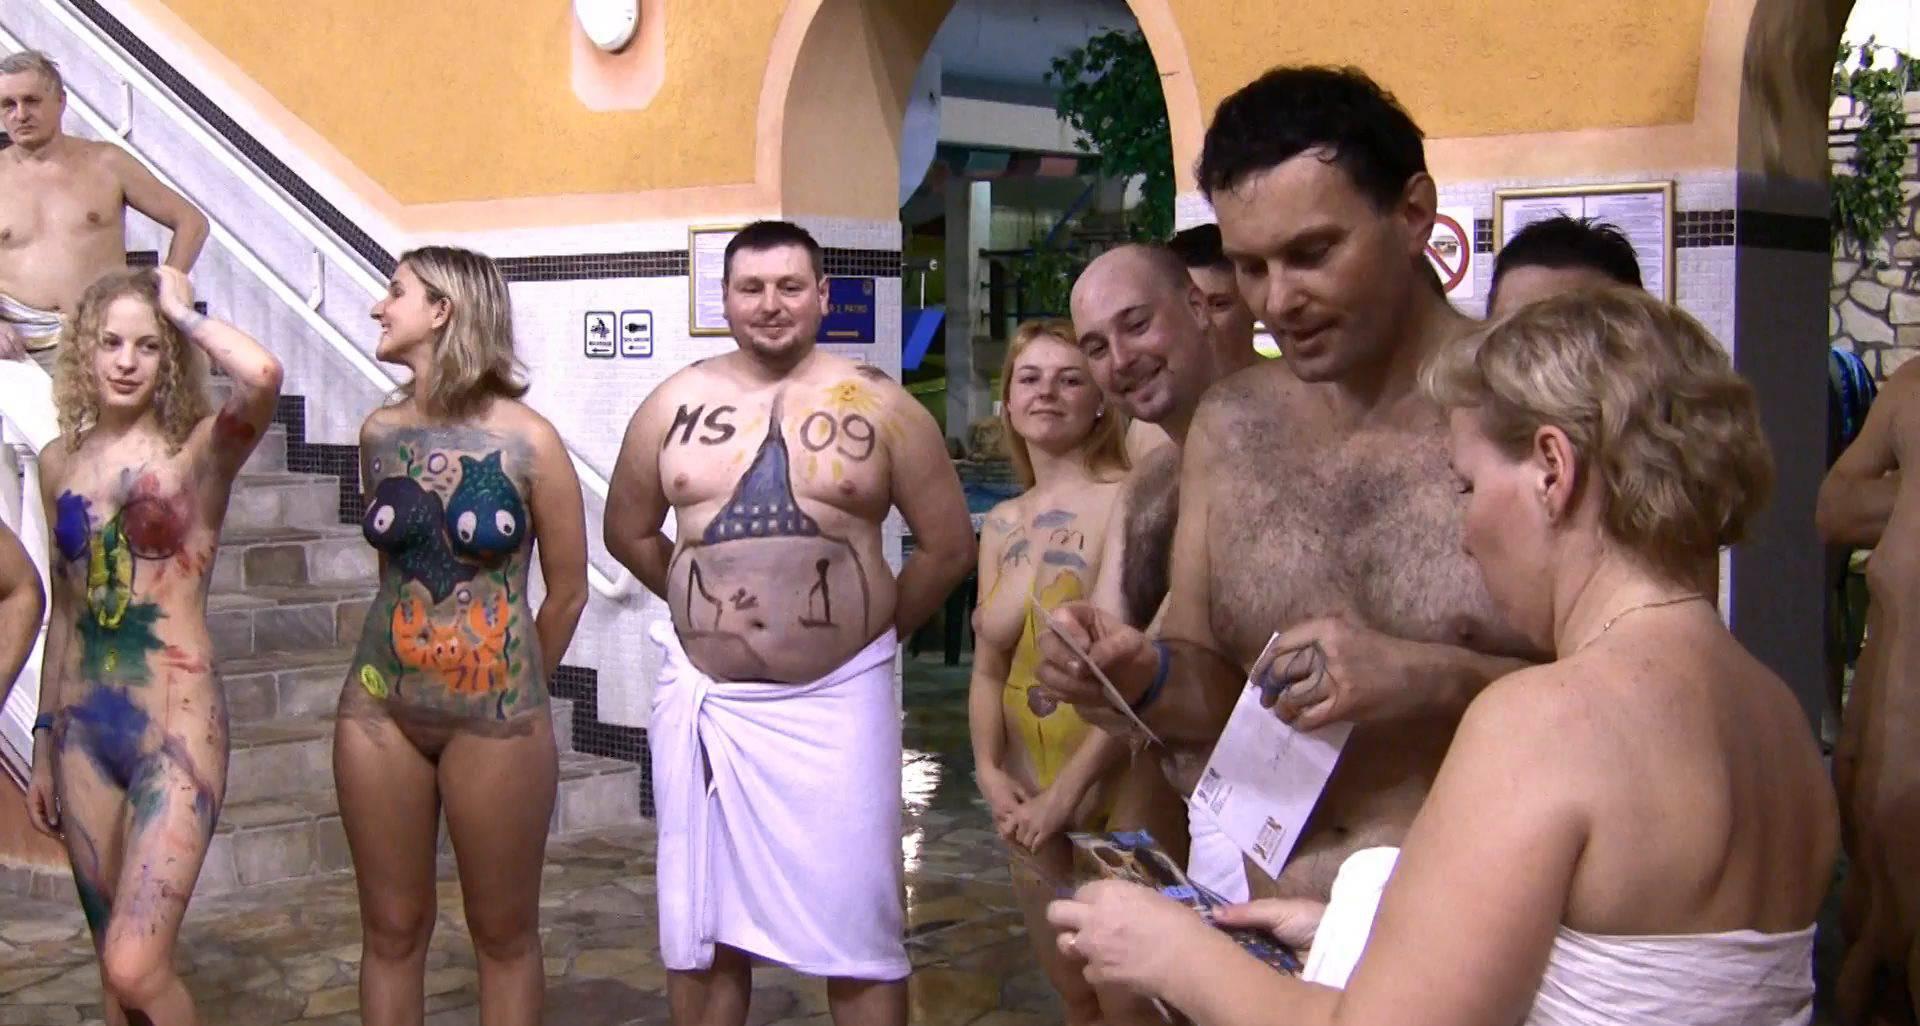 Nudist Videos Aqua Nude Relaxation - 2